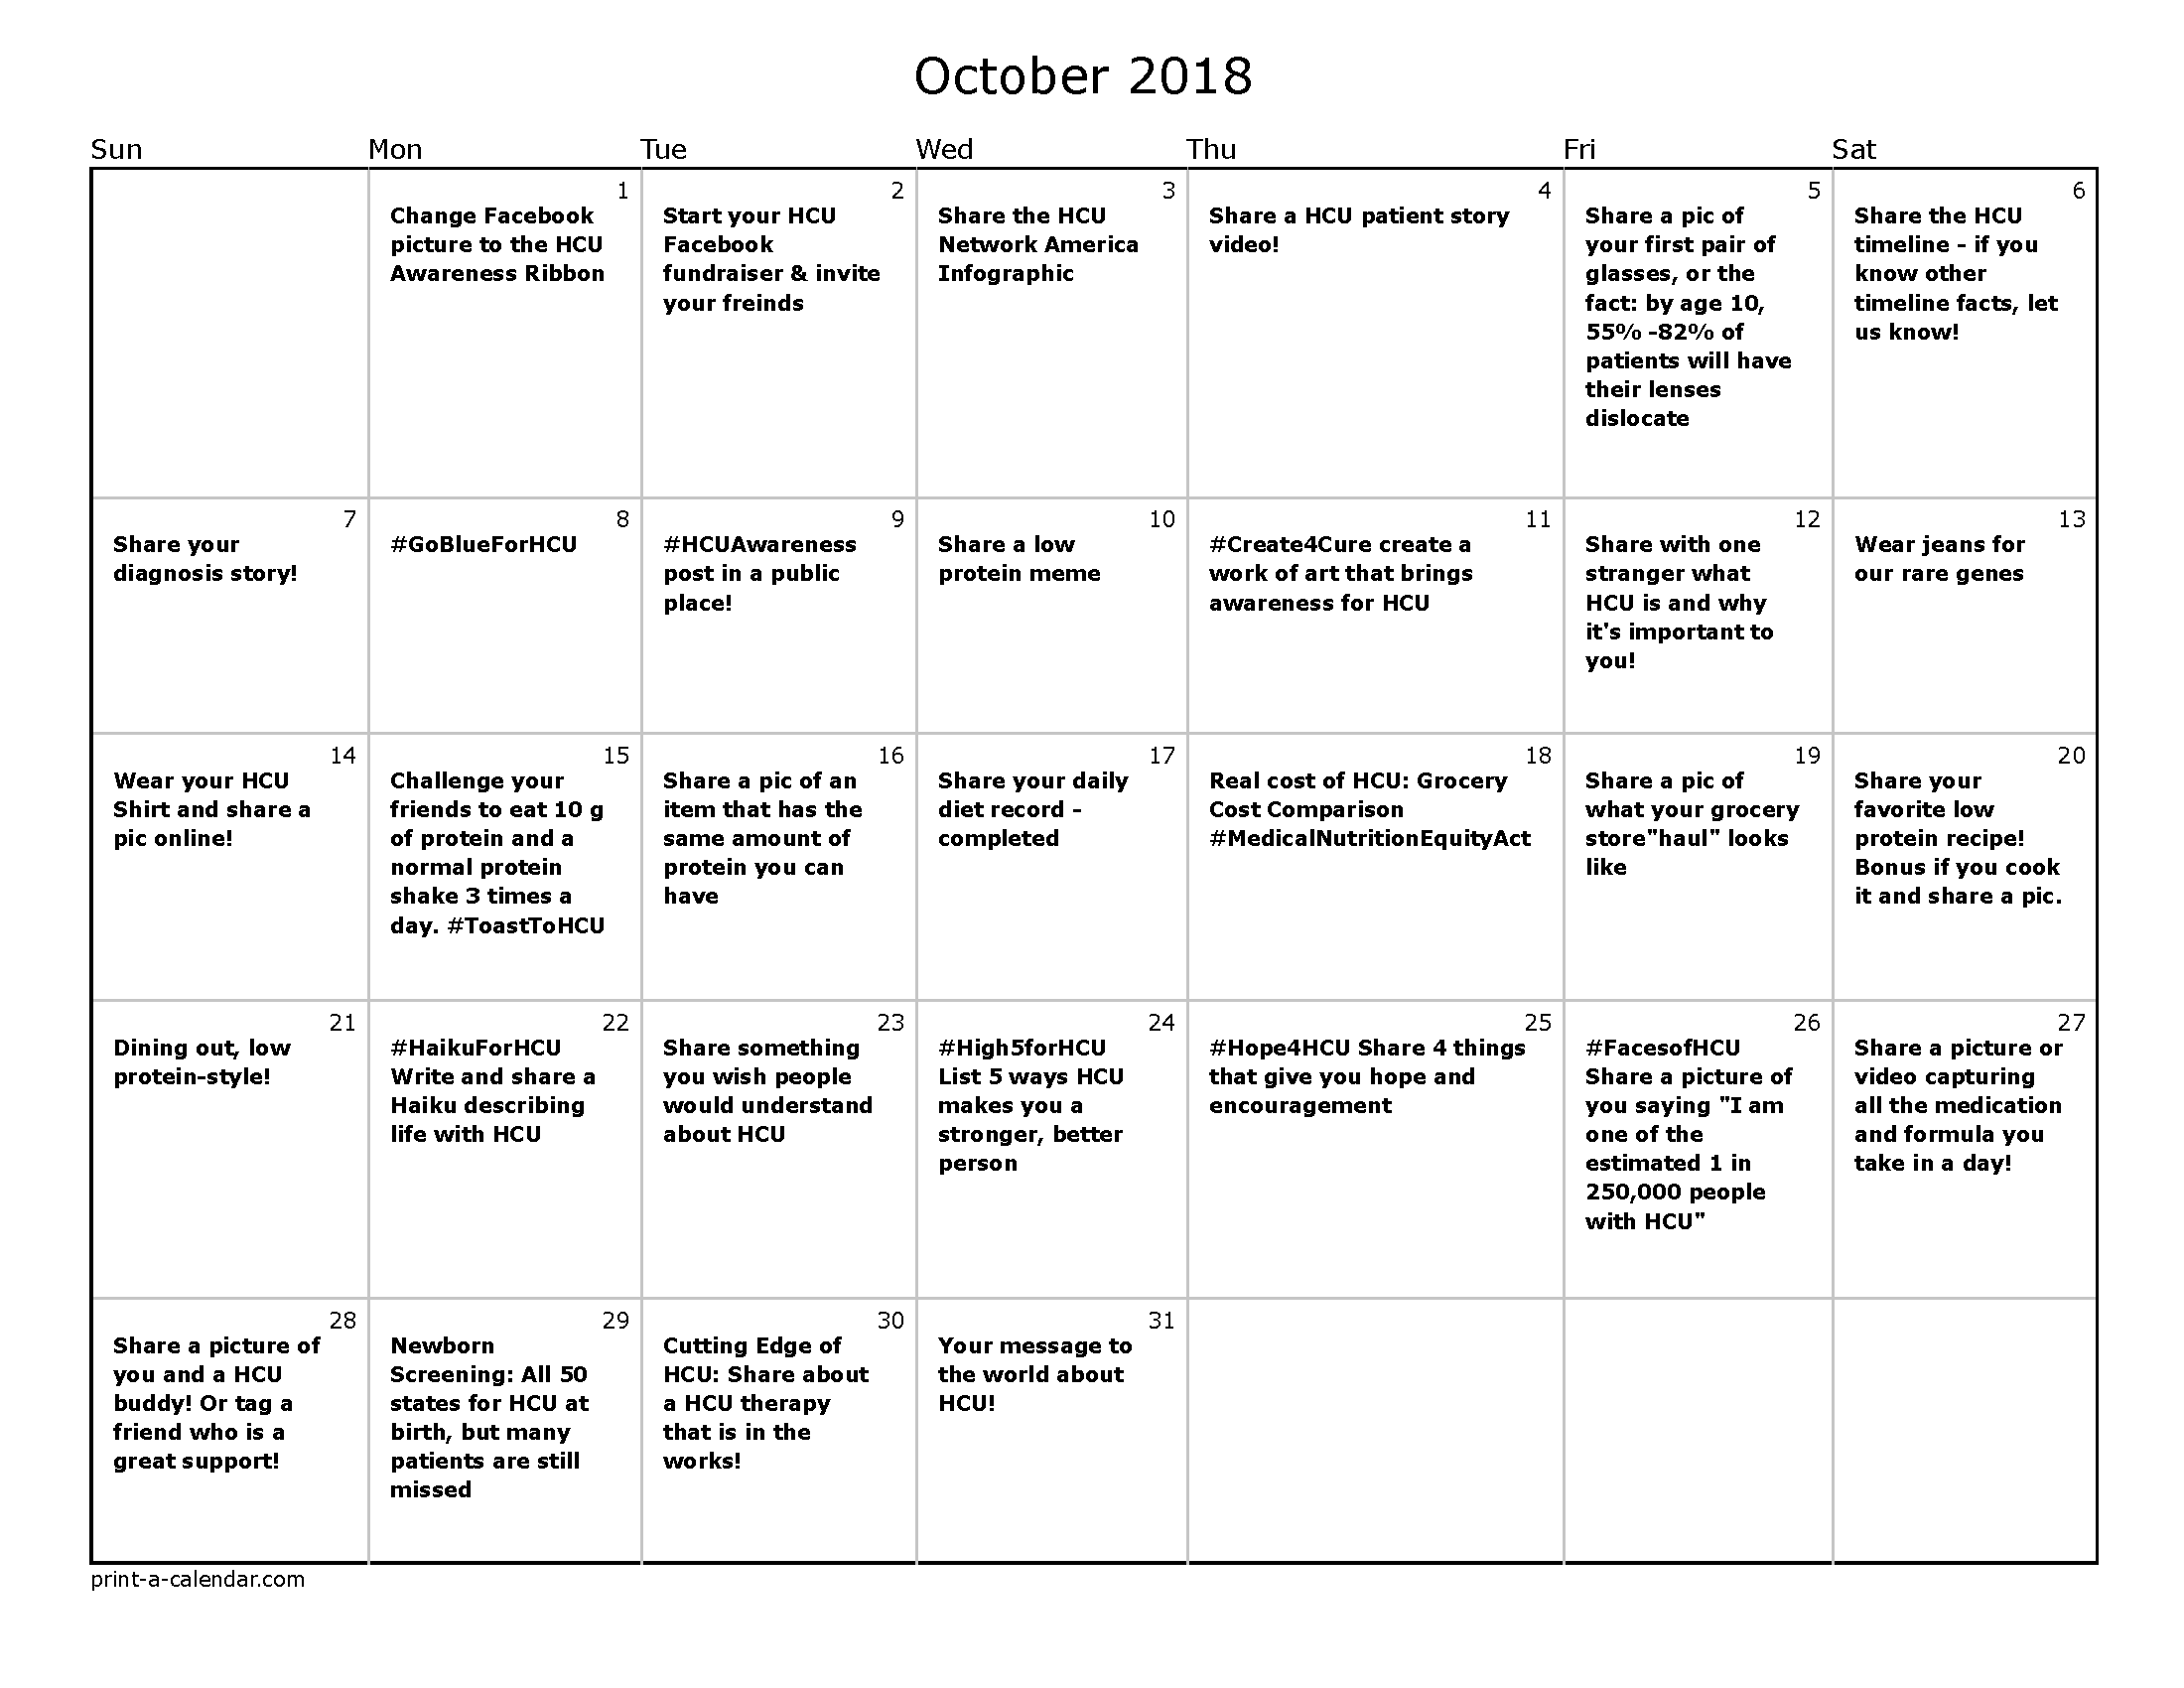 October 2018 Calendar _ Horizontal